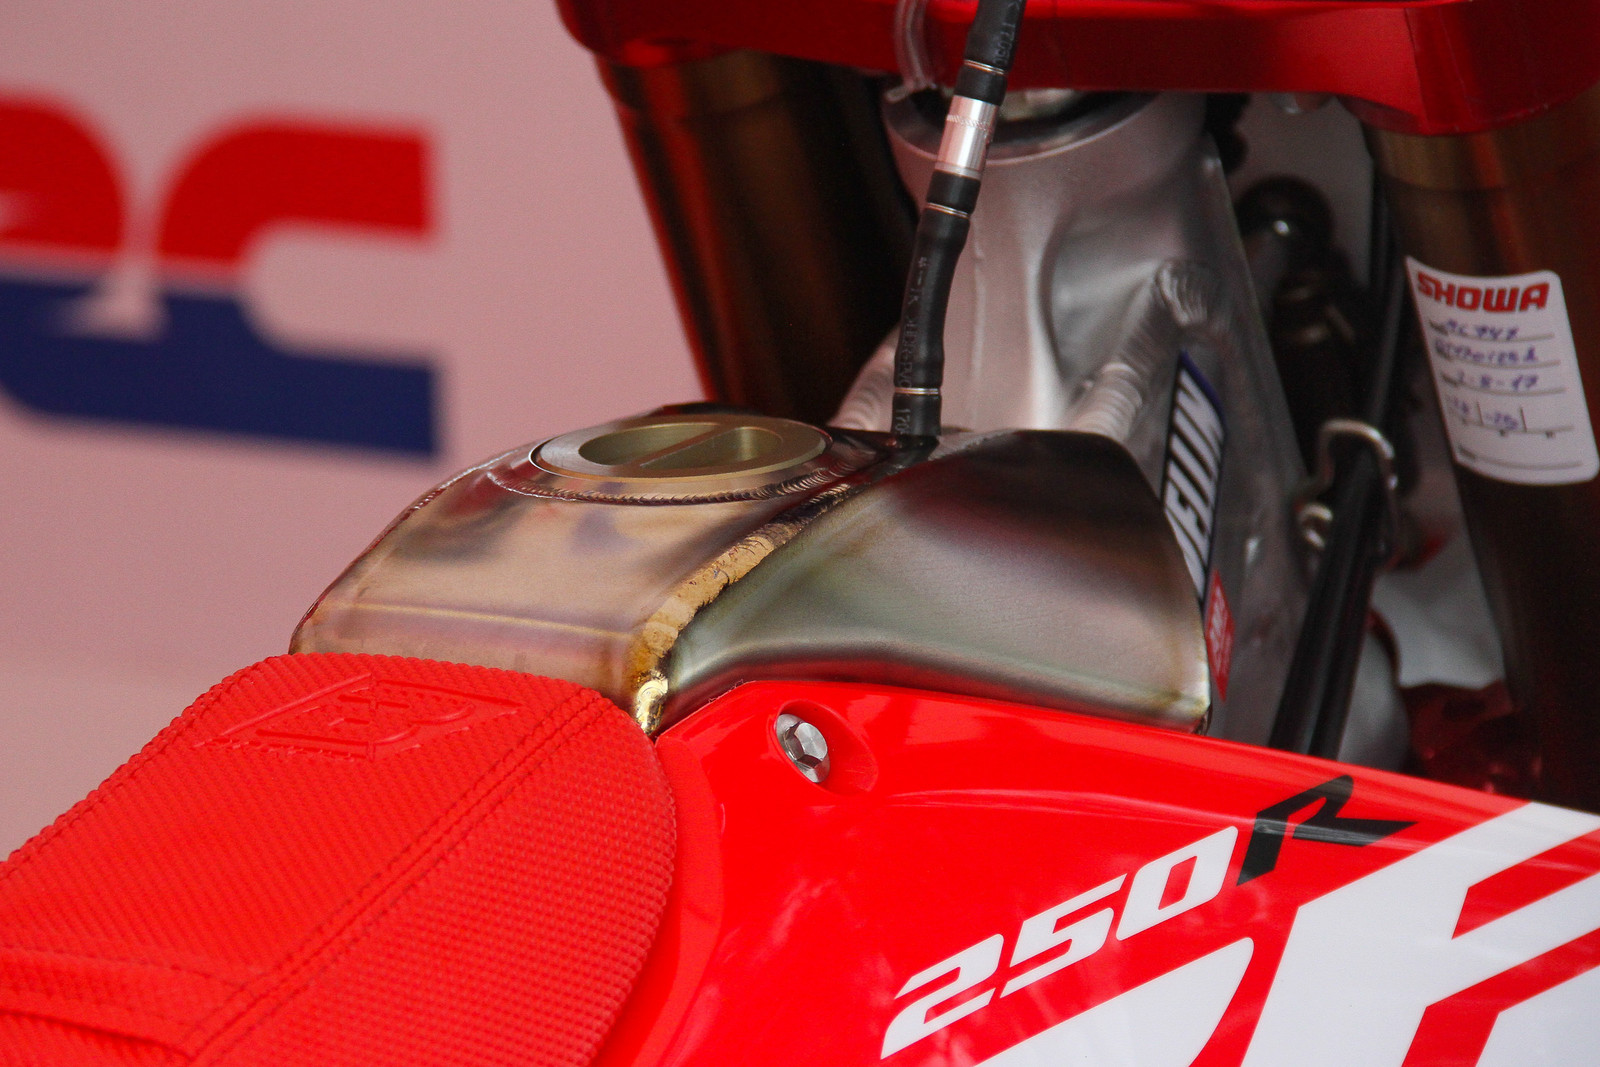 2018 Honda 250R Gas Tank - ayearinmx - Motocross Pictures - Vital MX